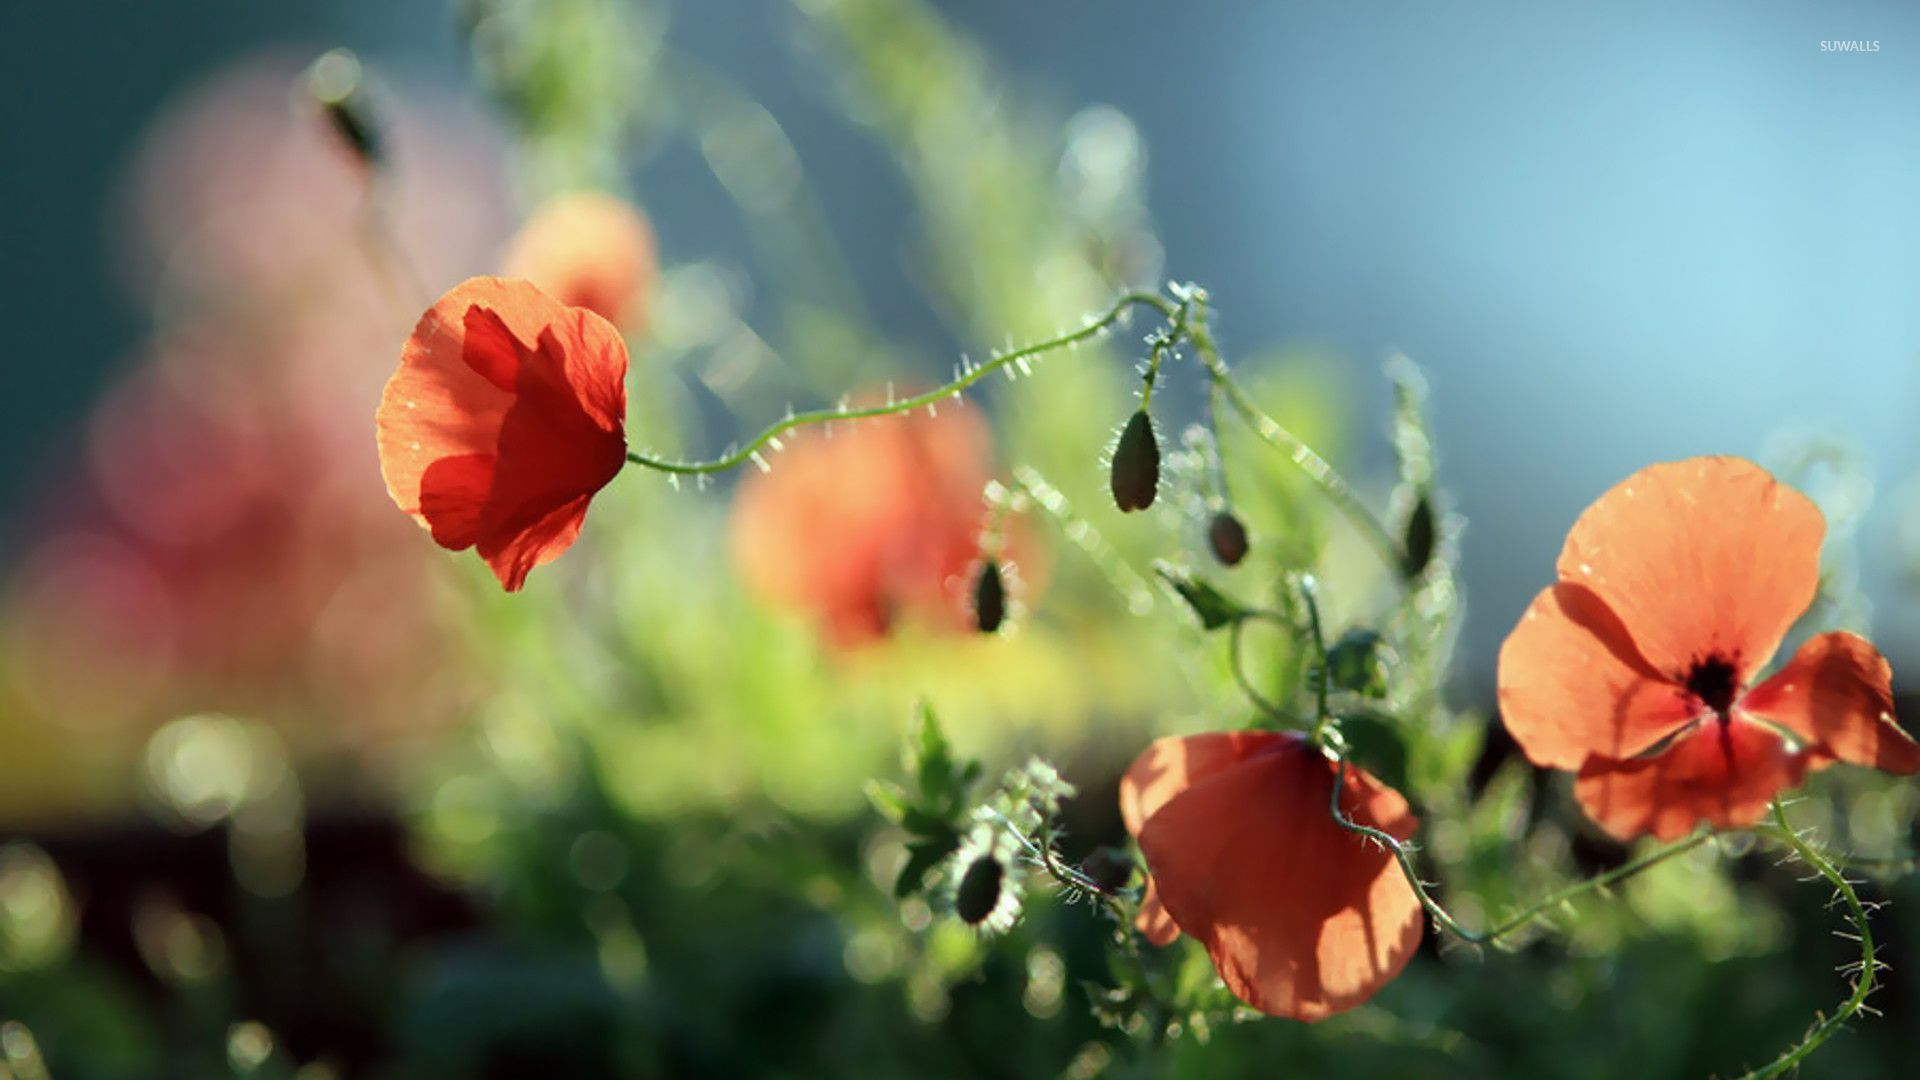 wild poppy flowers on - photo #15